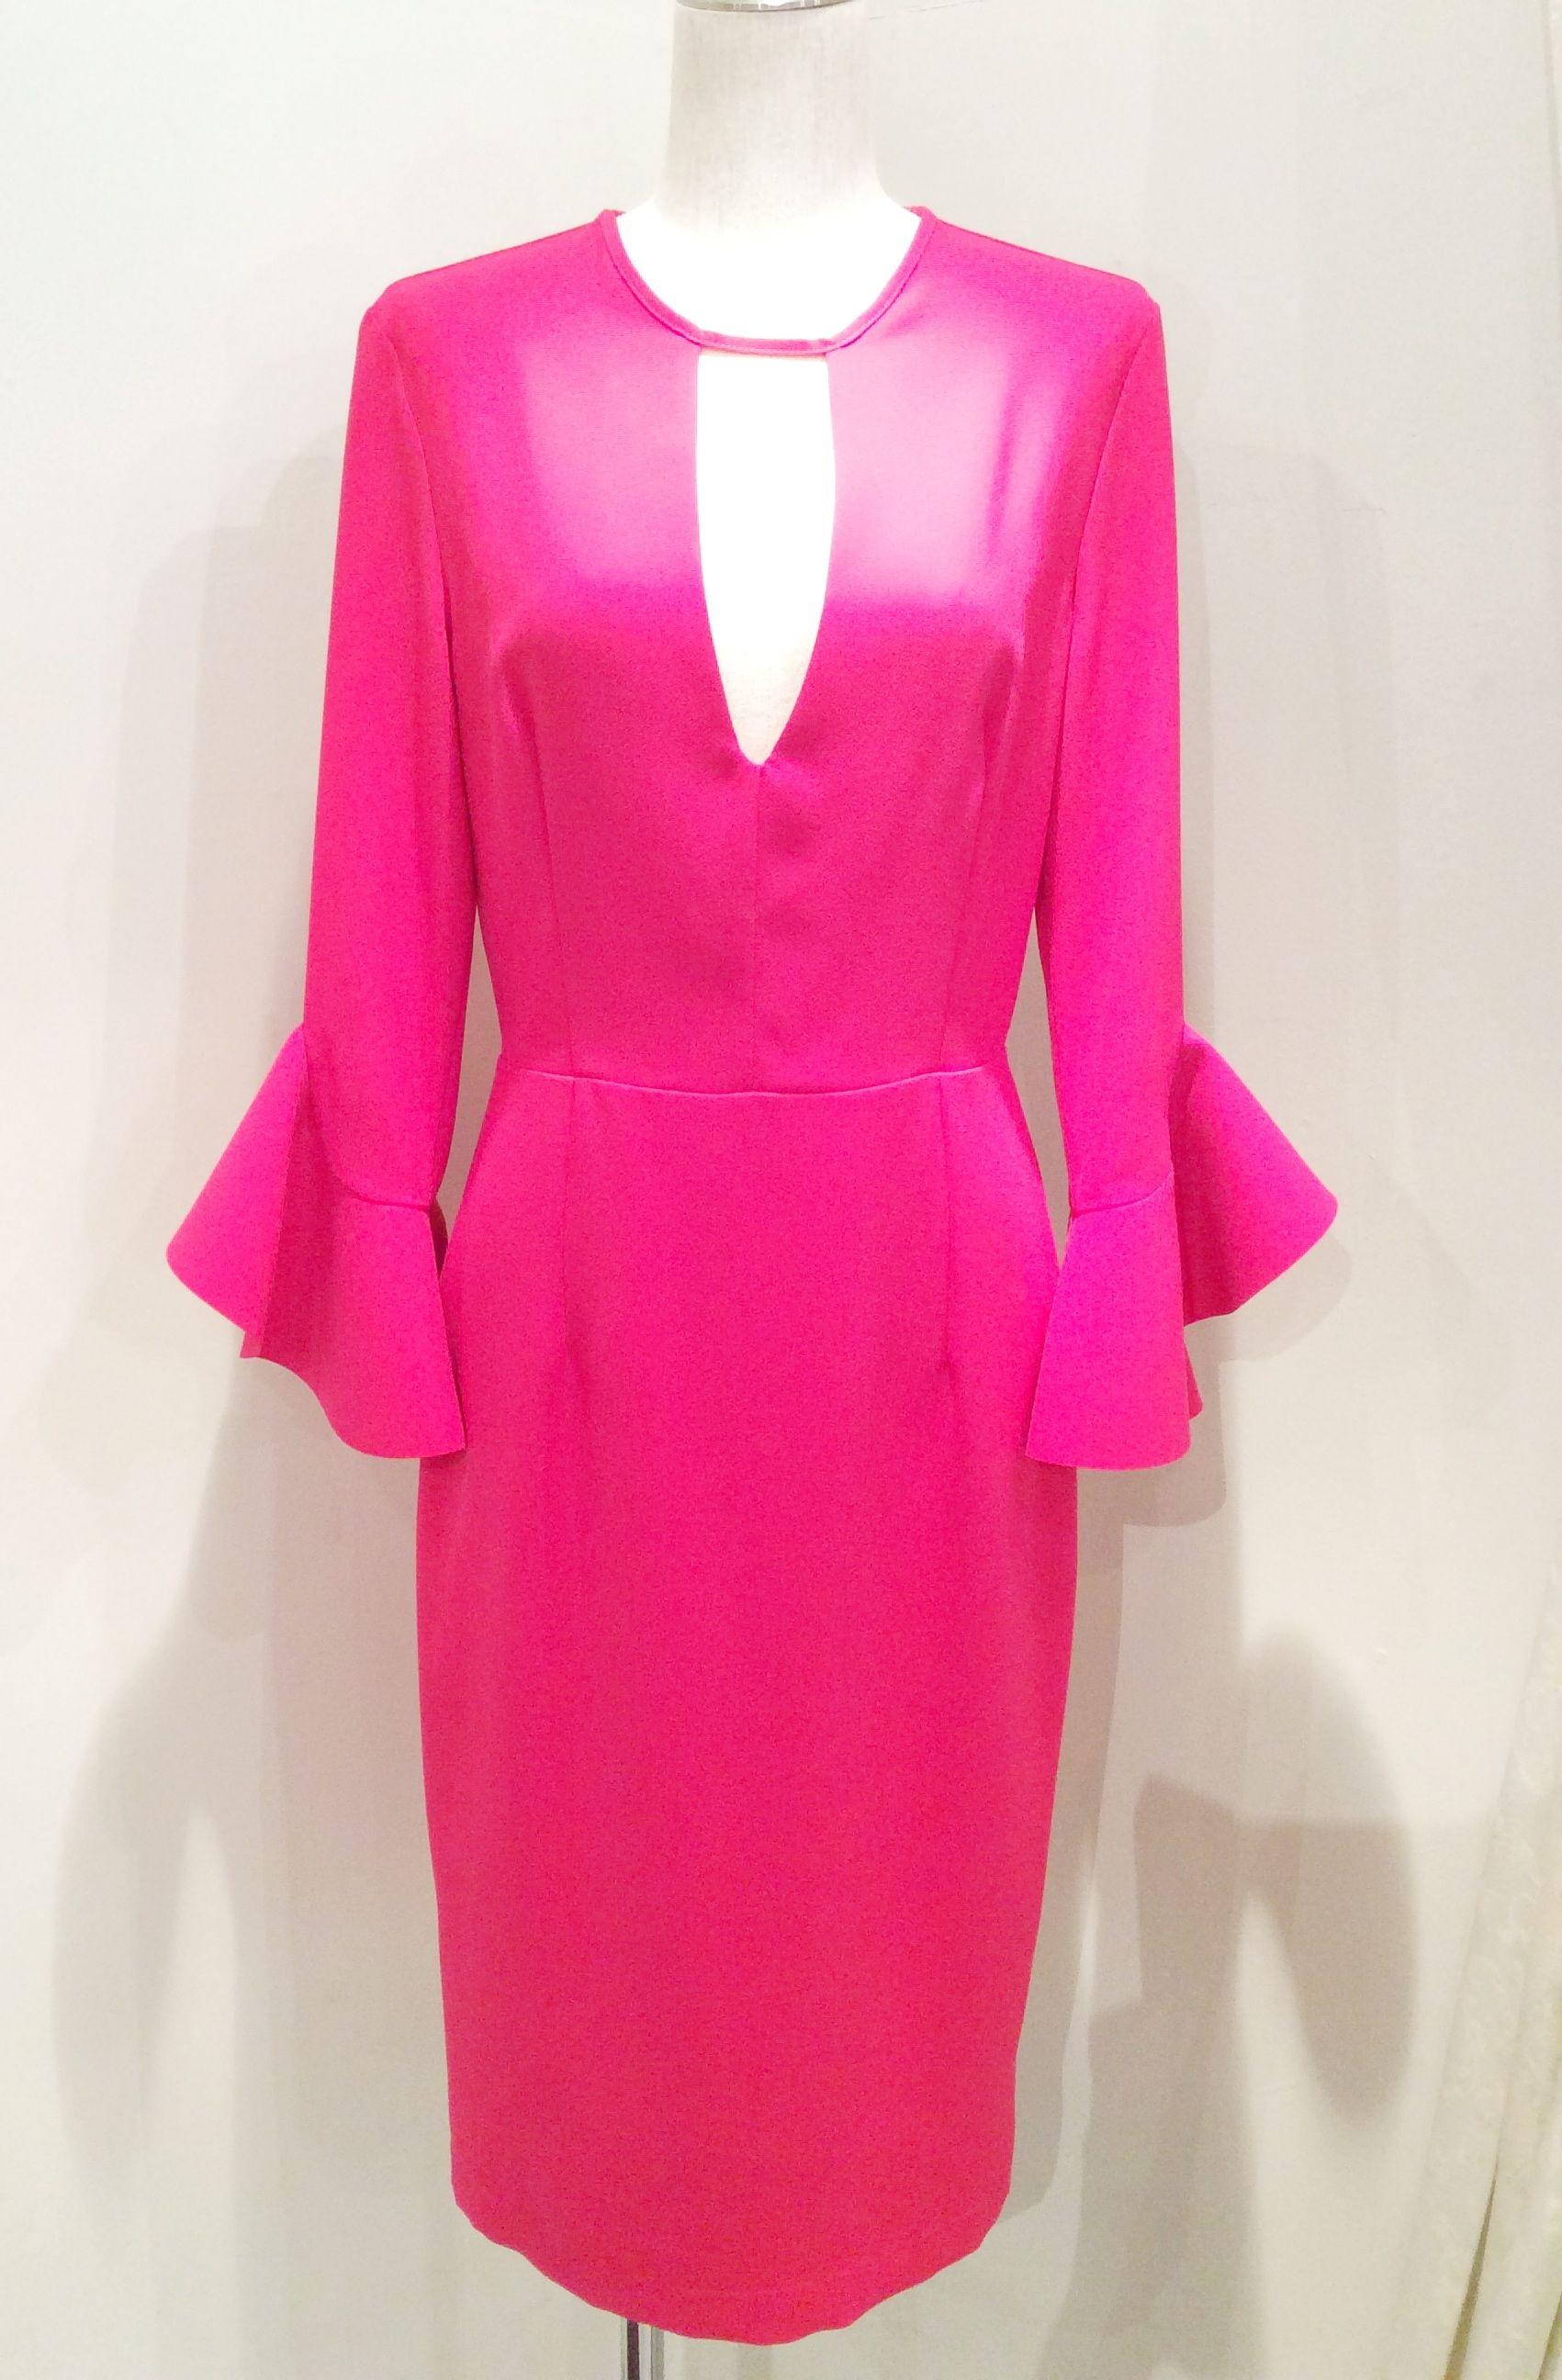 PINKO(ピンコ) bell sleeves dress  1G1357-6352